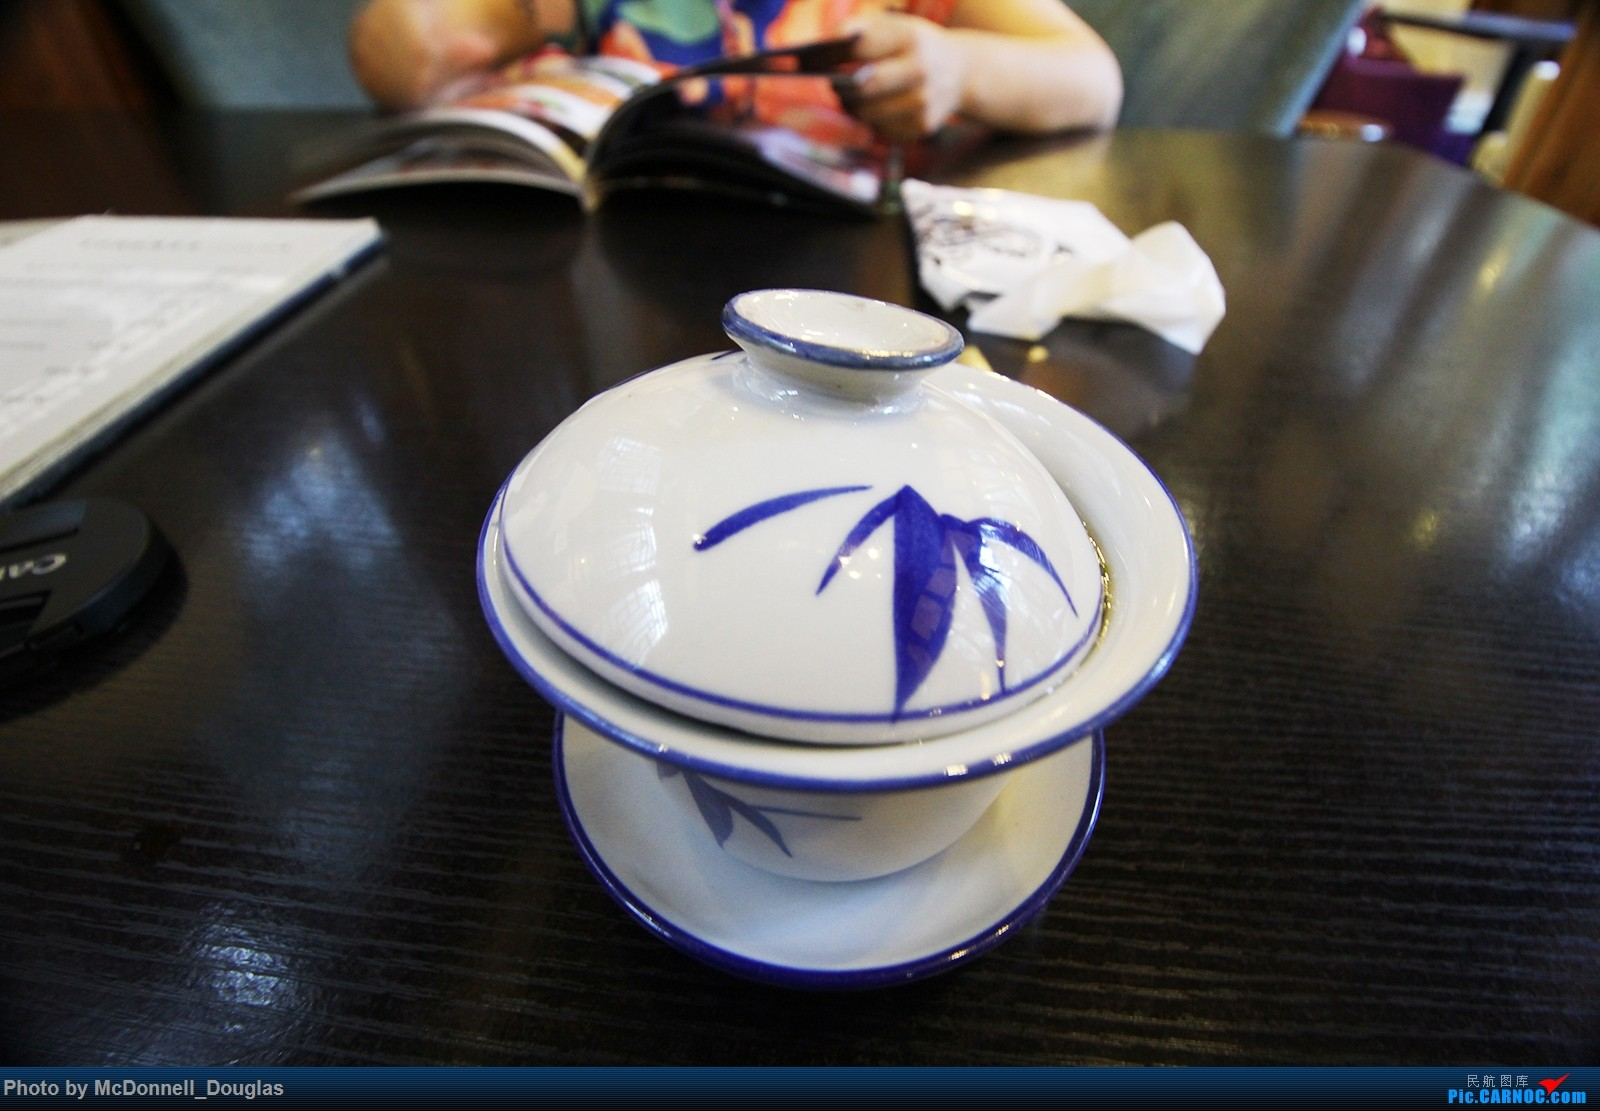 Re:[原创]【上海飞友会】【zc带你走天下(3)】再访祖辈年轻时工作的土地,父母年少时生活戈壁,跨越大半个中国去看新疆,回程小游蓉城(下)